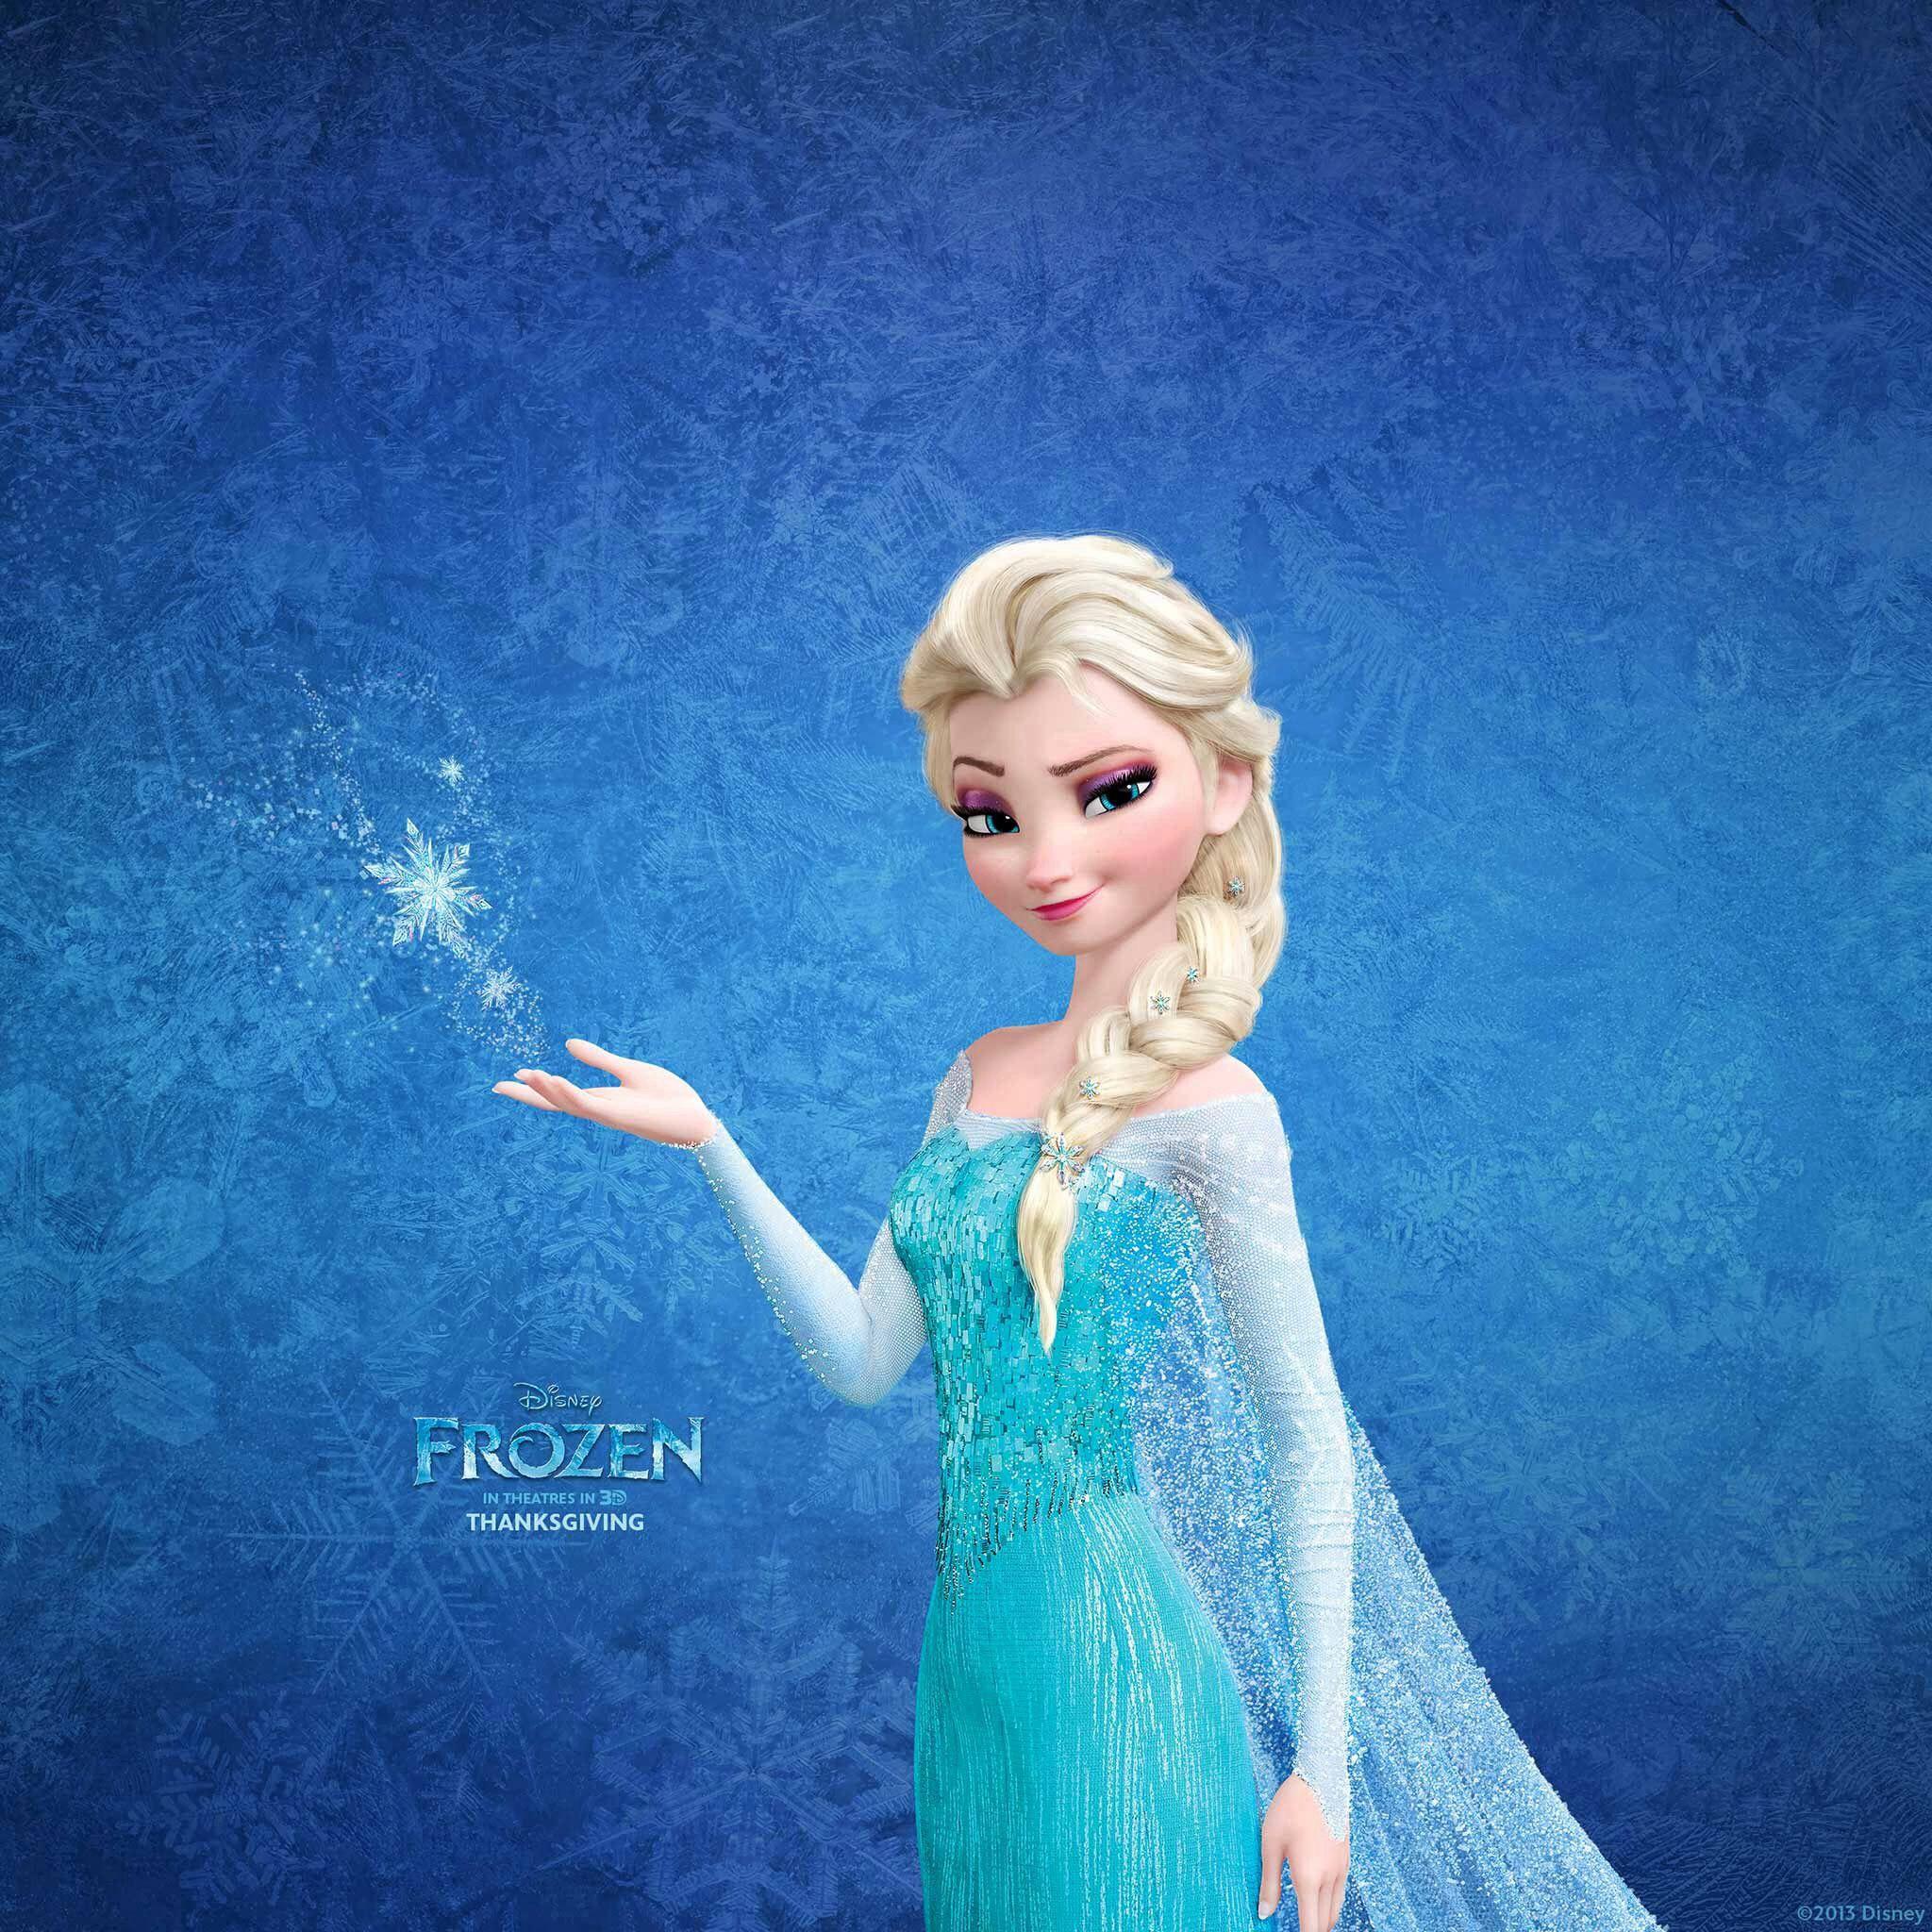 Frozen's Elsa iOS 7 Wallpaper iPad & iPhone Wallpaper